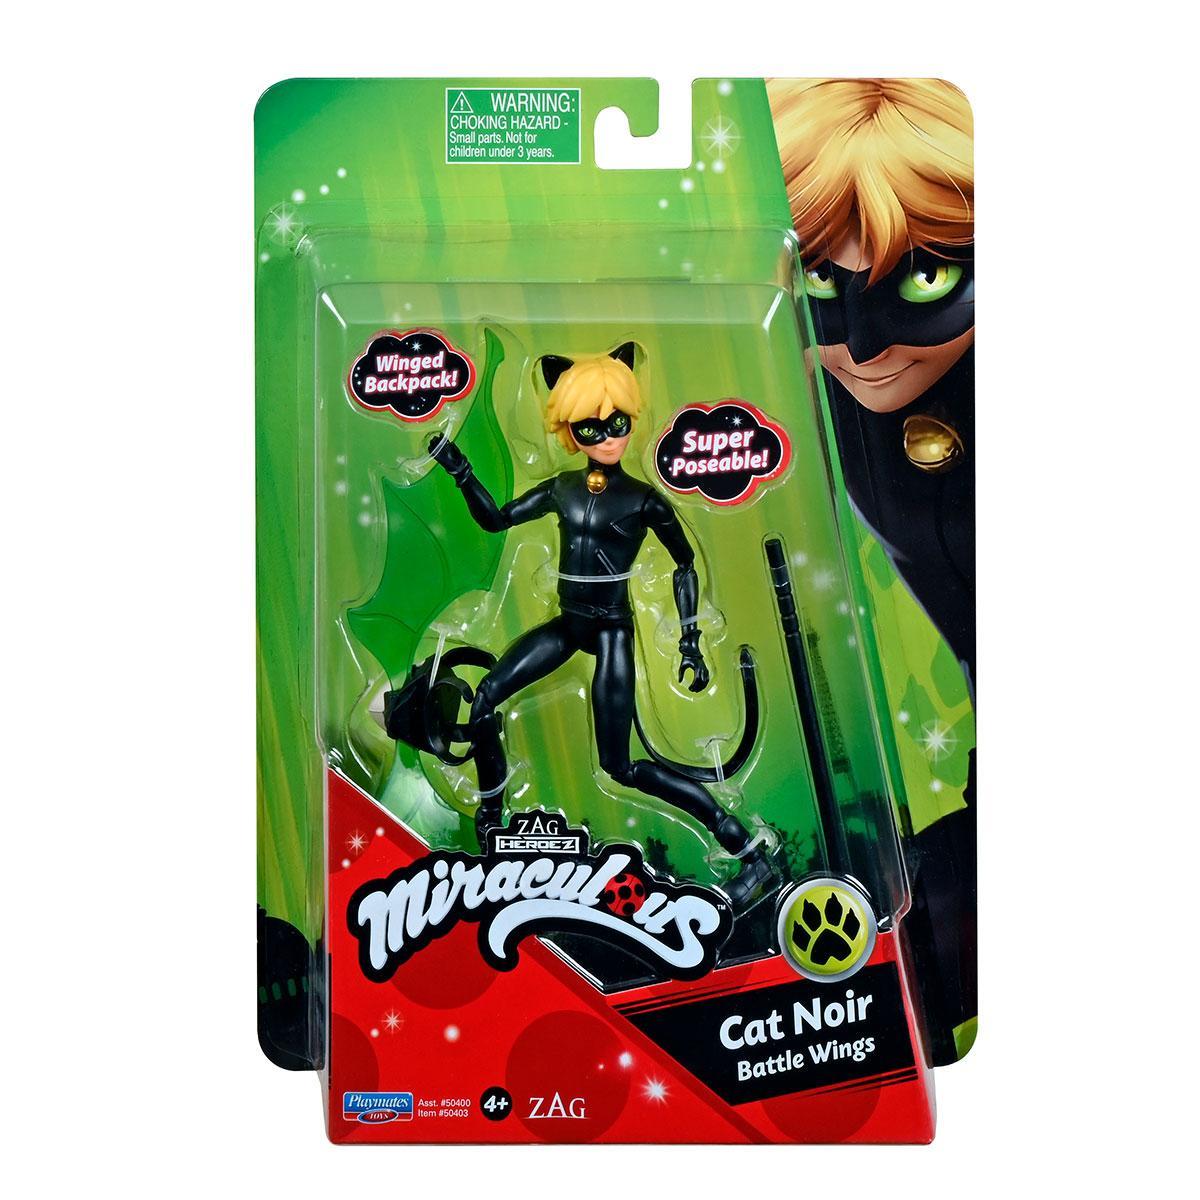 Маленькая Кукла-мальчик Леди Баг и Супер-Кот S2 - Супер Кот 13 см Miraculous Small Doll Cat Noir 50403